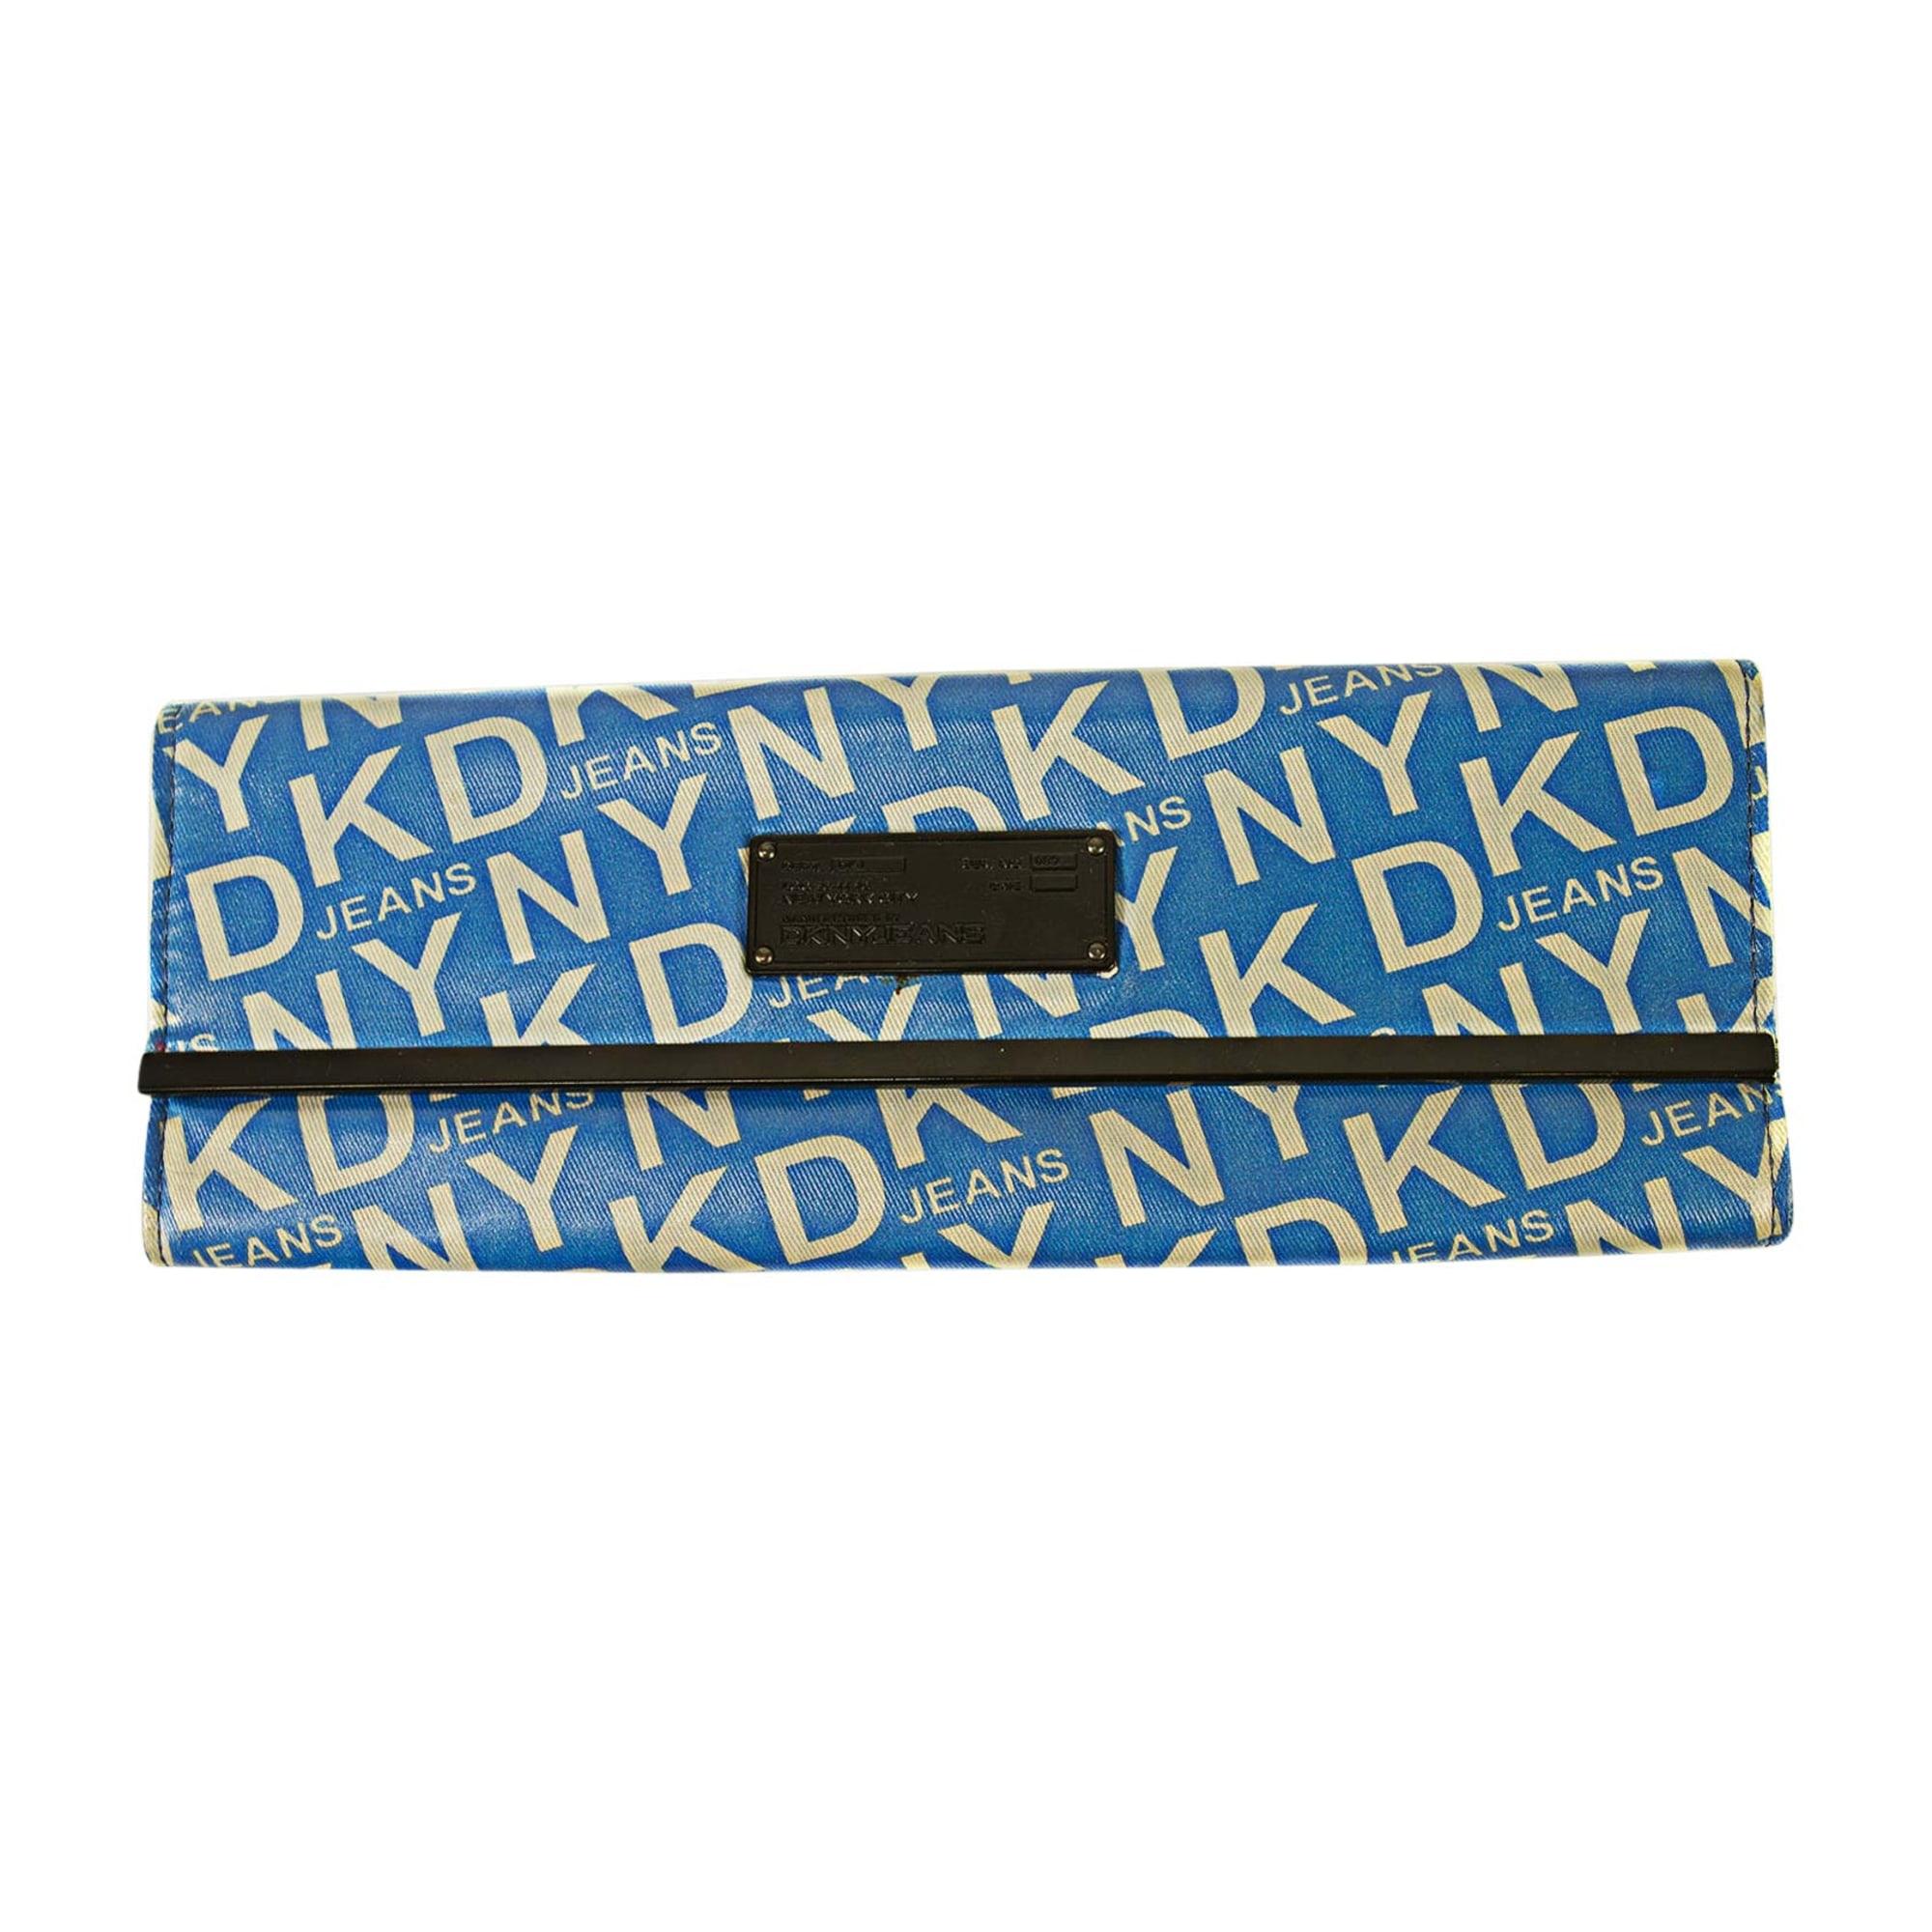 Sac pochette en tissu DONNA KARAN canvas bleu